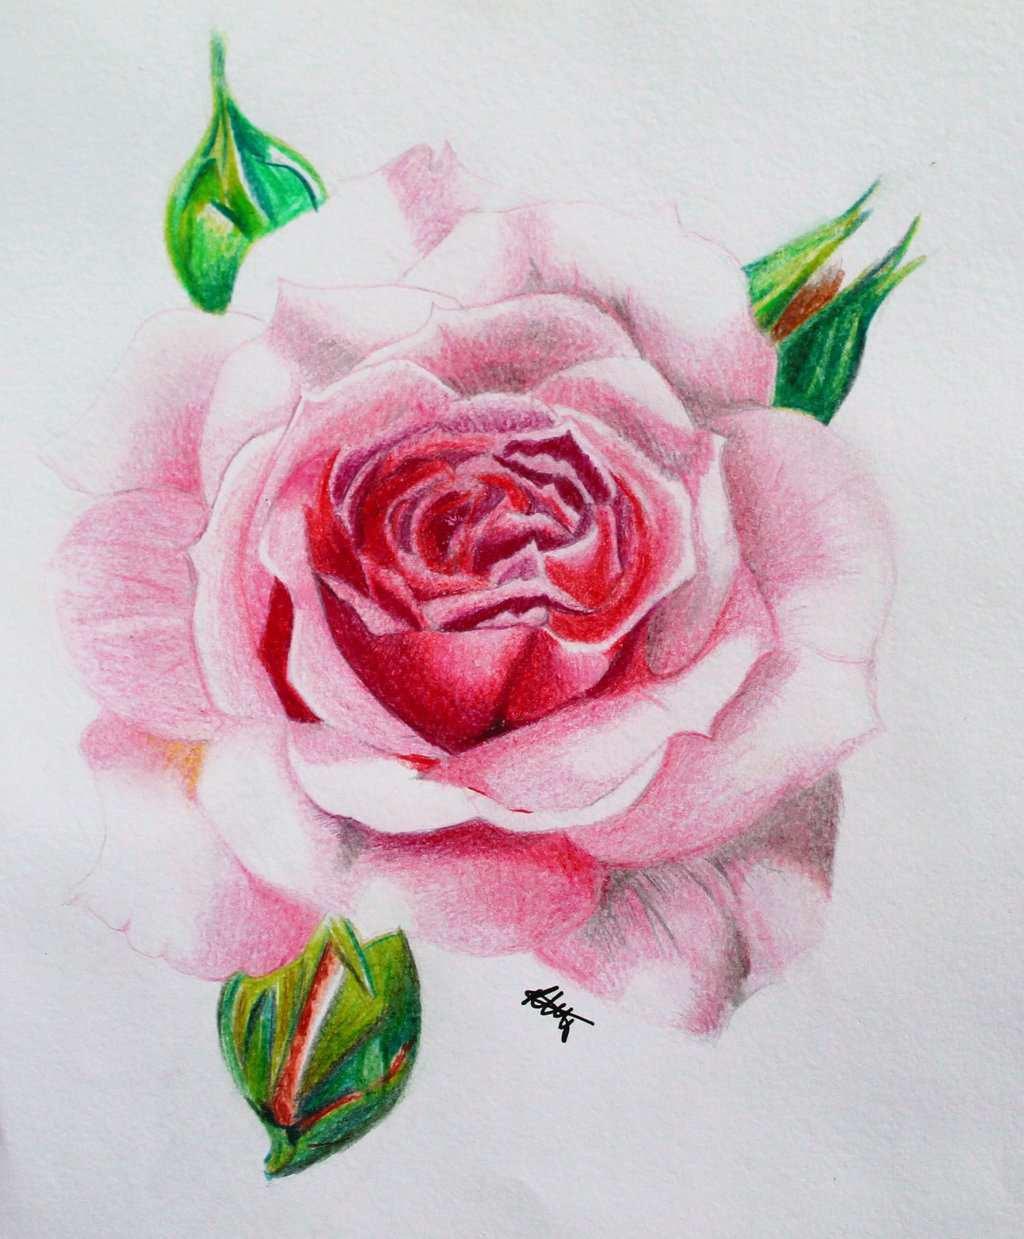 101+ Gambar Bunga Mawar Lukis Paling Keren